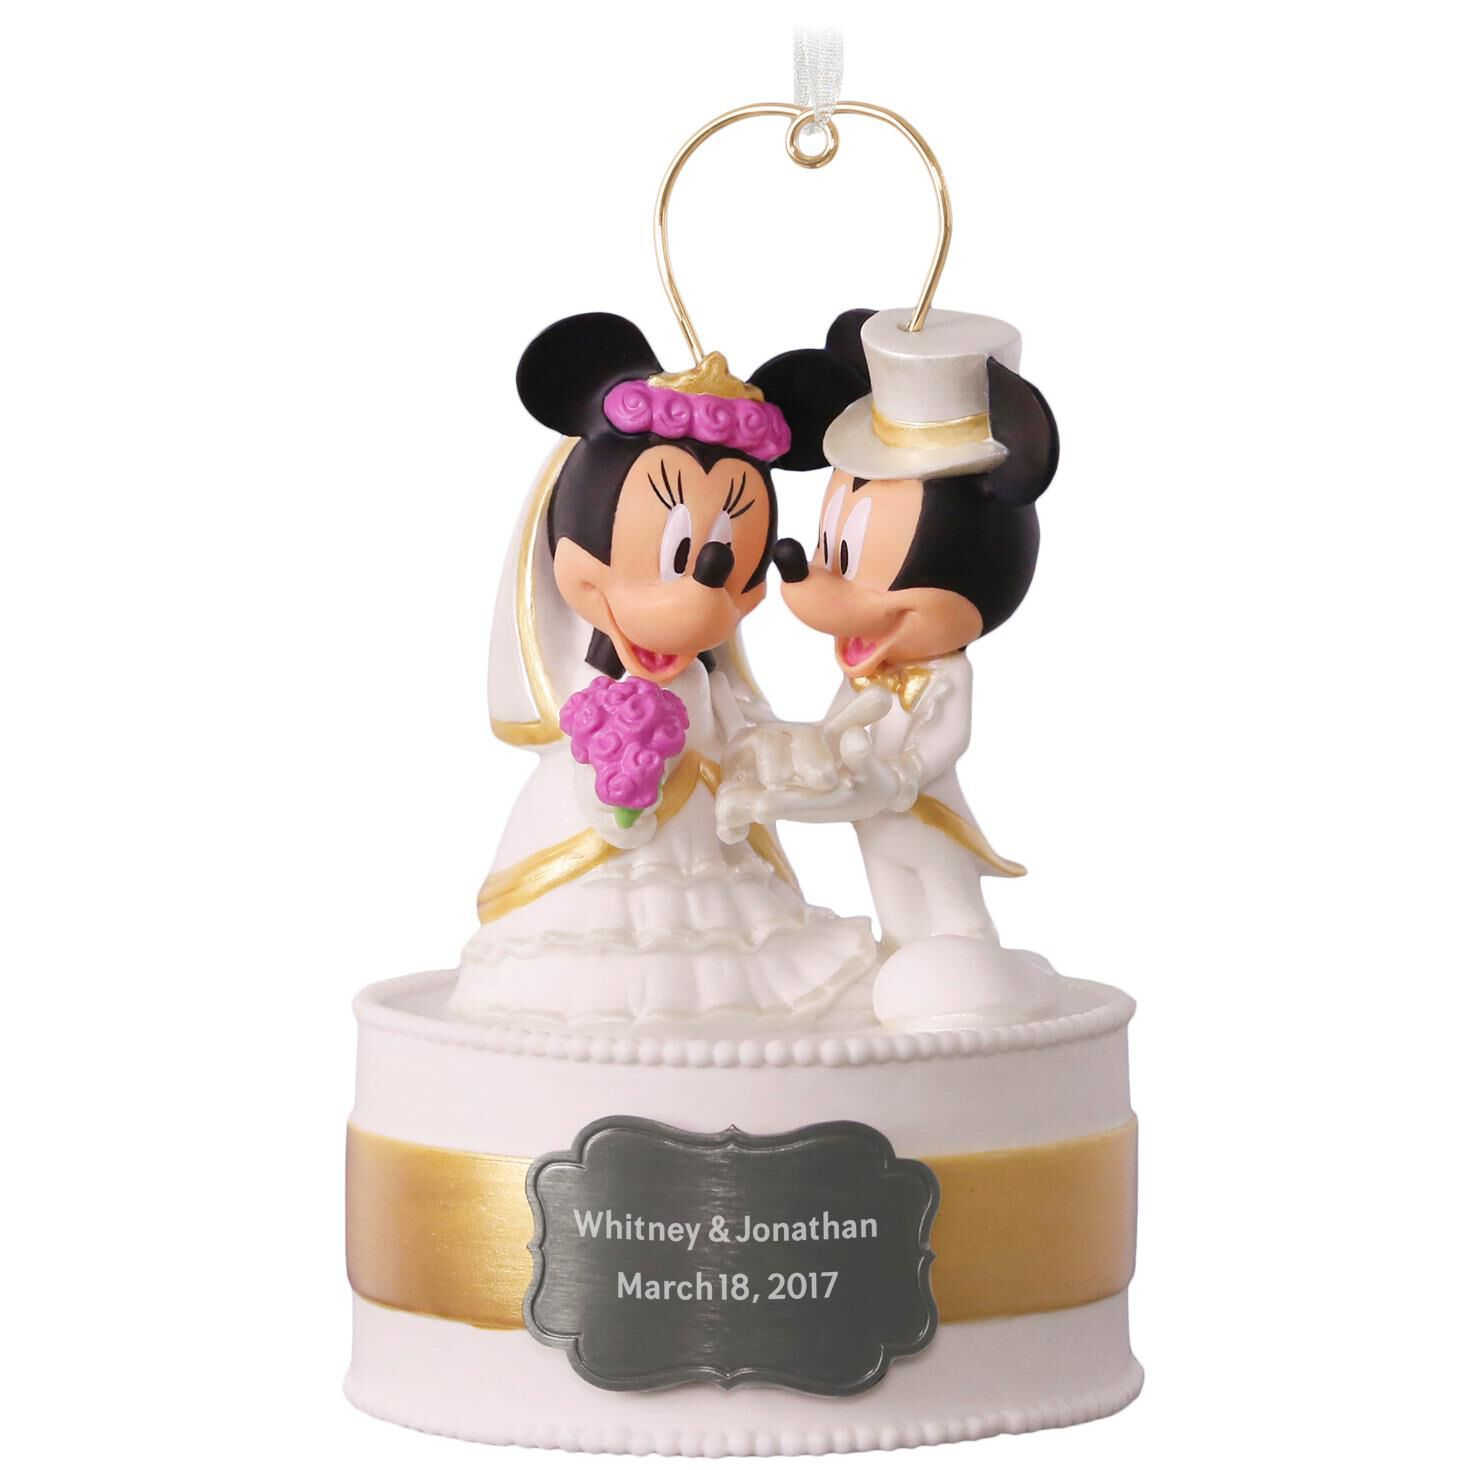 Disney Mickey And Minnie Personalized Wedding Cake Ornament Ornaments Hallmark